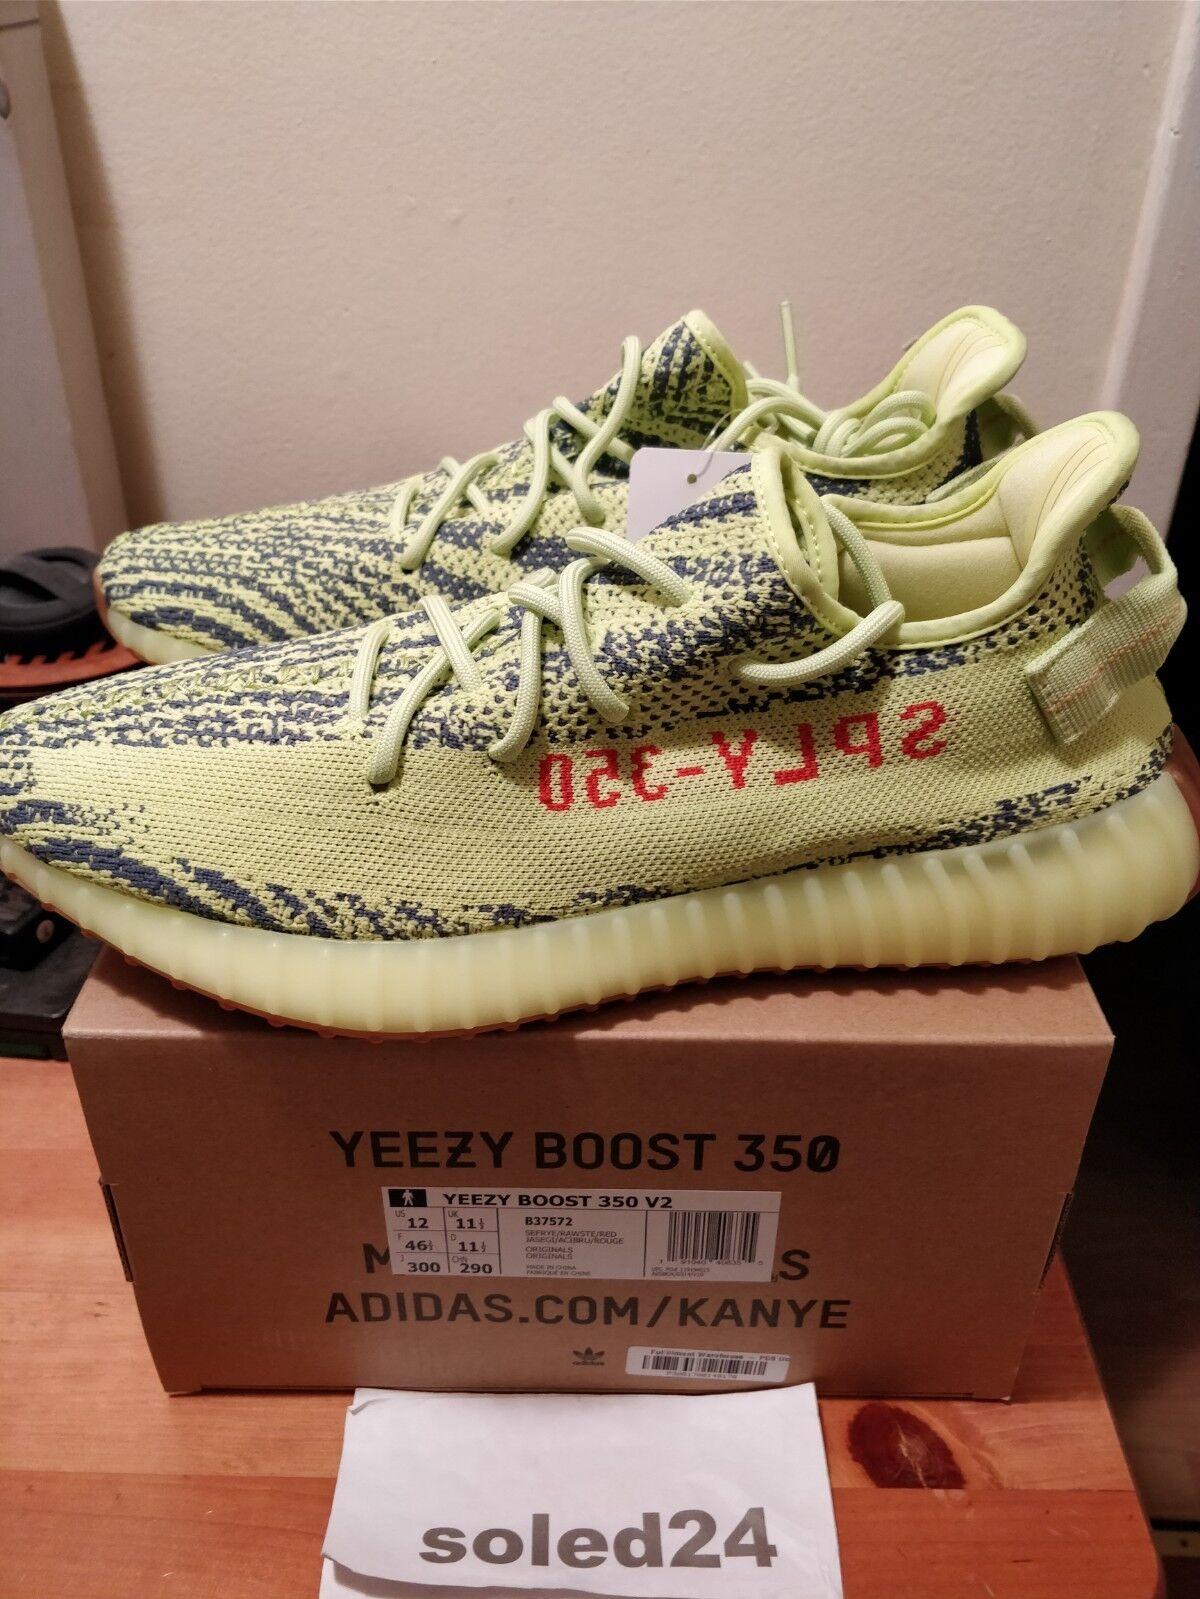 Adidas Yeezy Boost 350 V2 US 12 Semi Frozen Yellow B37572